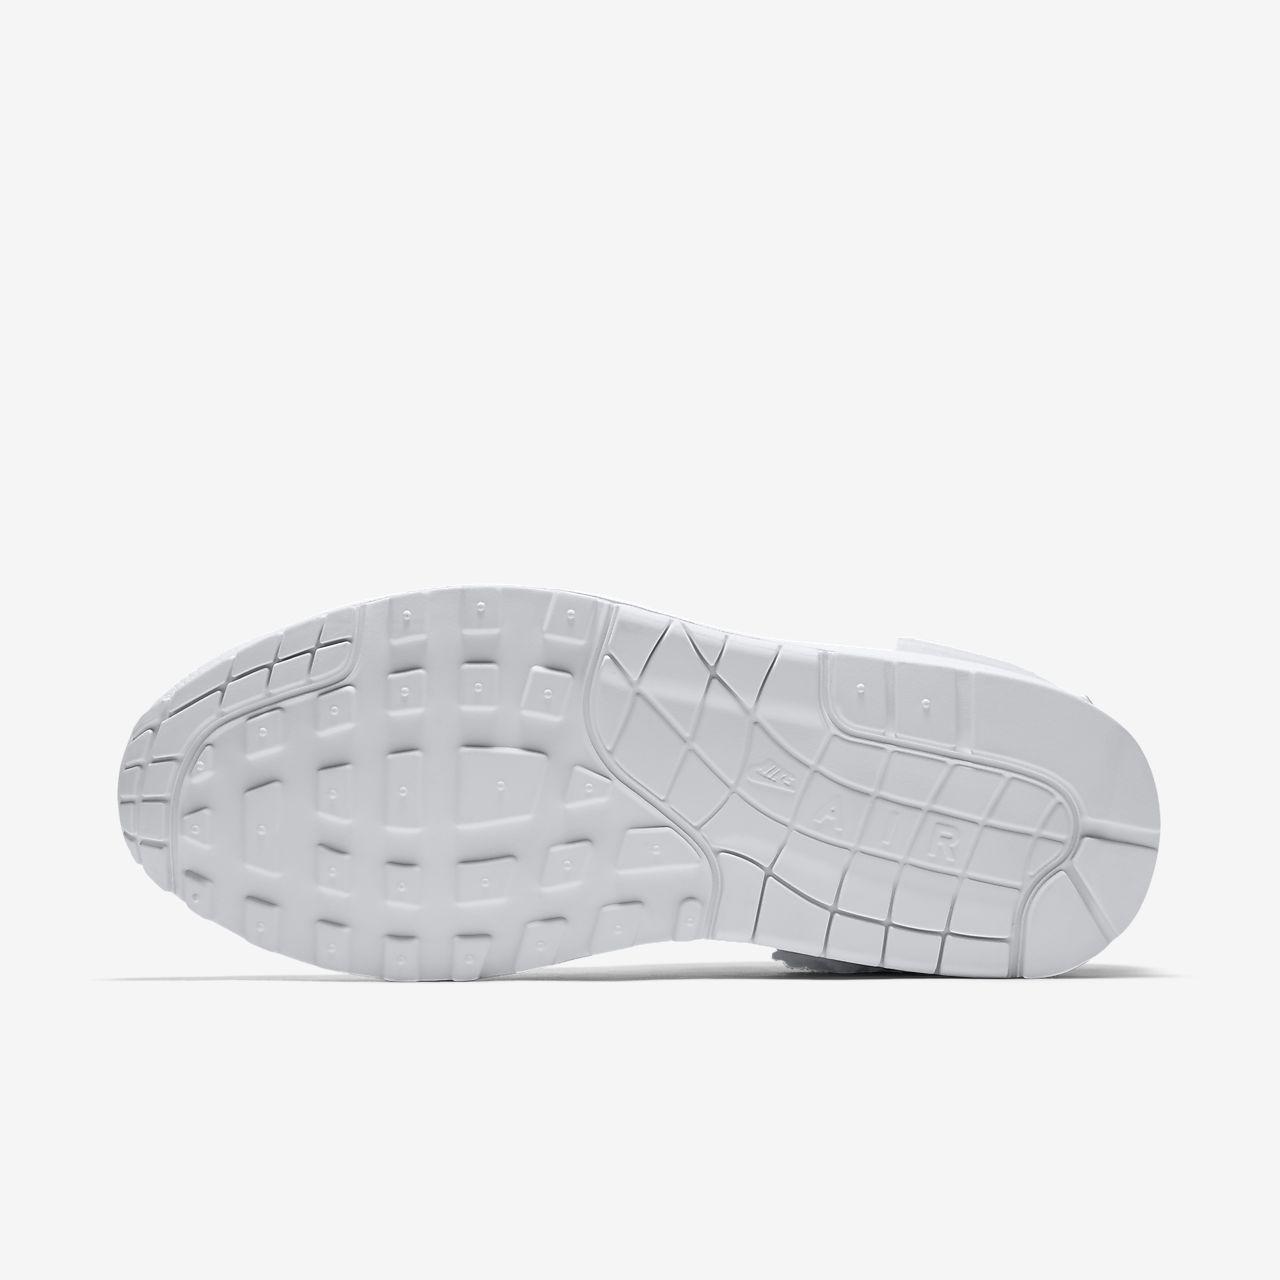 quality design 5207d 73db2 scarpa nike air max 1-100 bianco bianco bianco aq7826-100